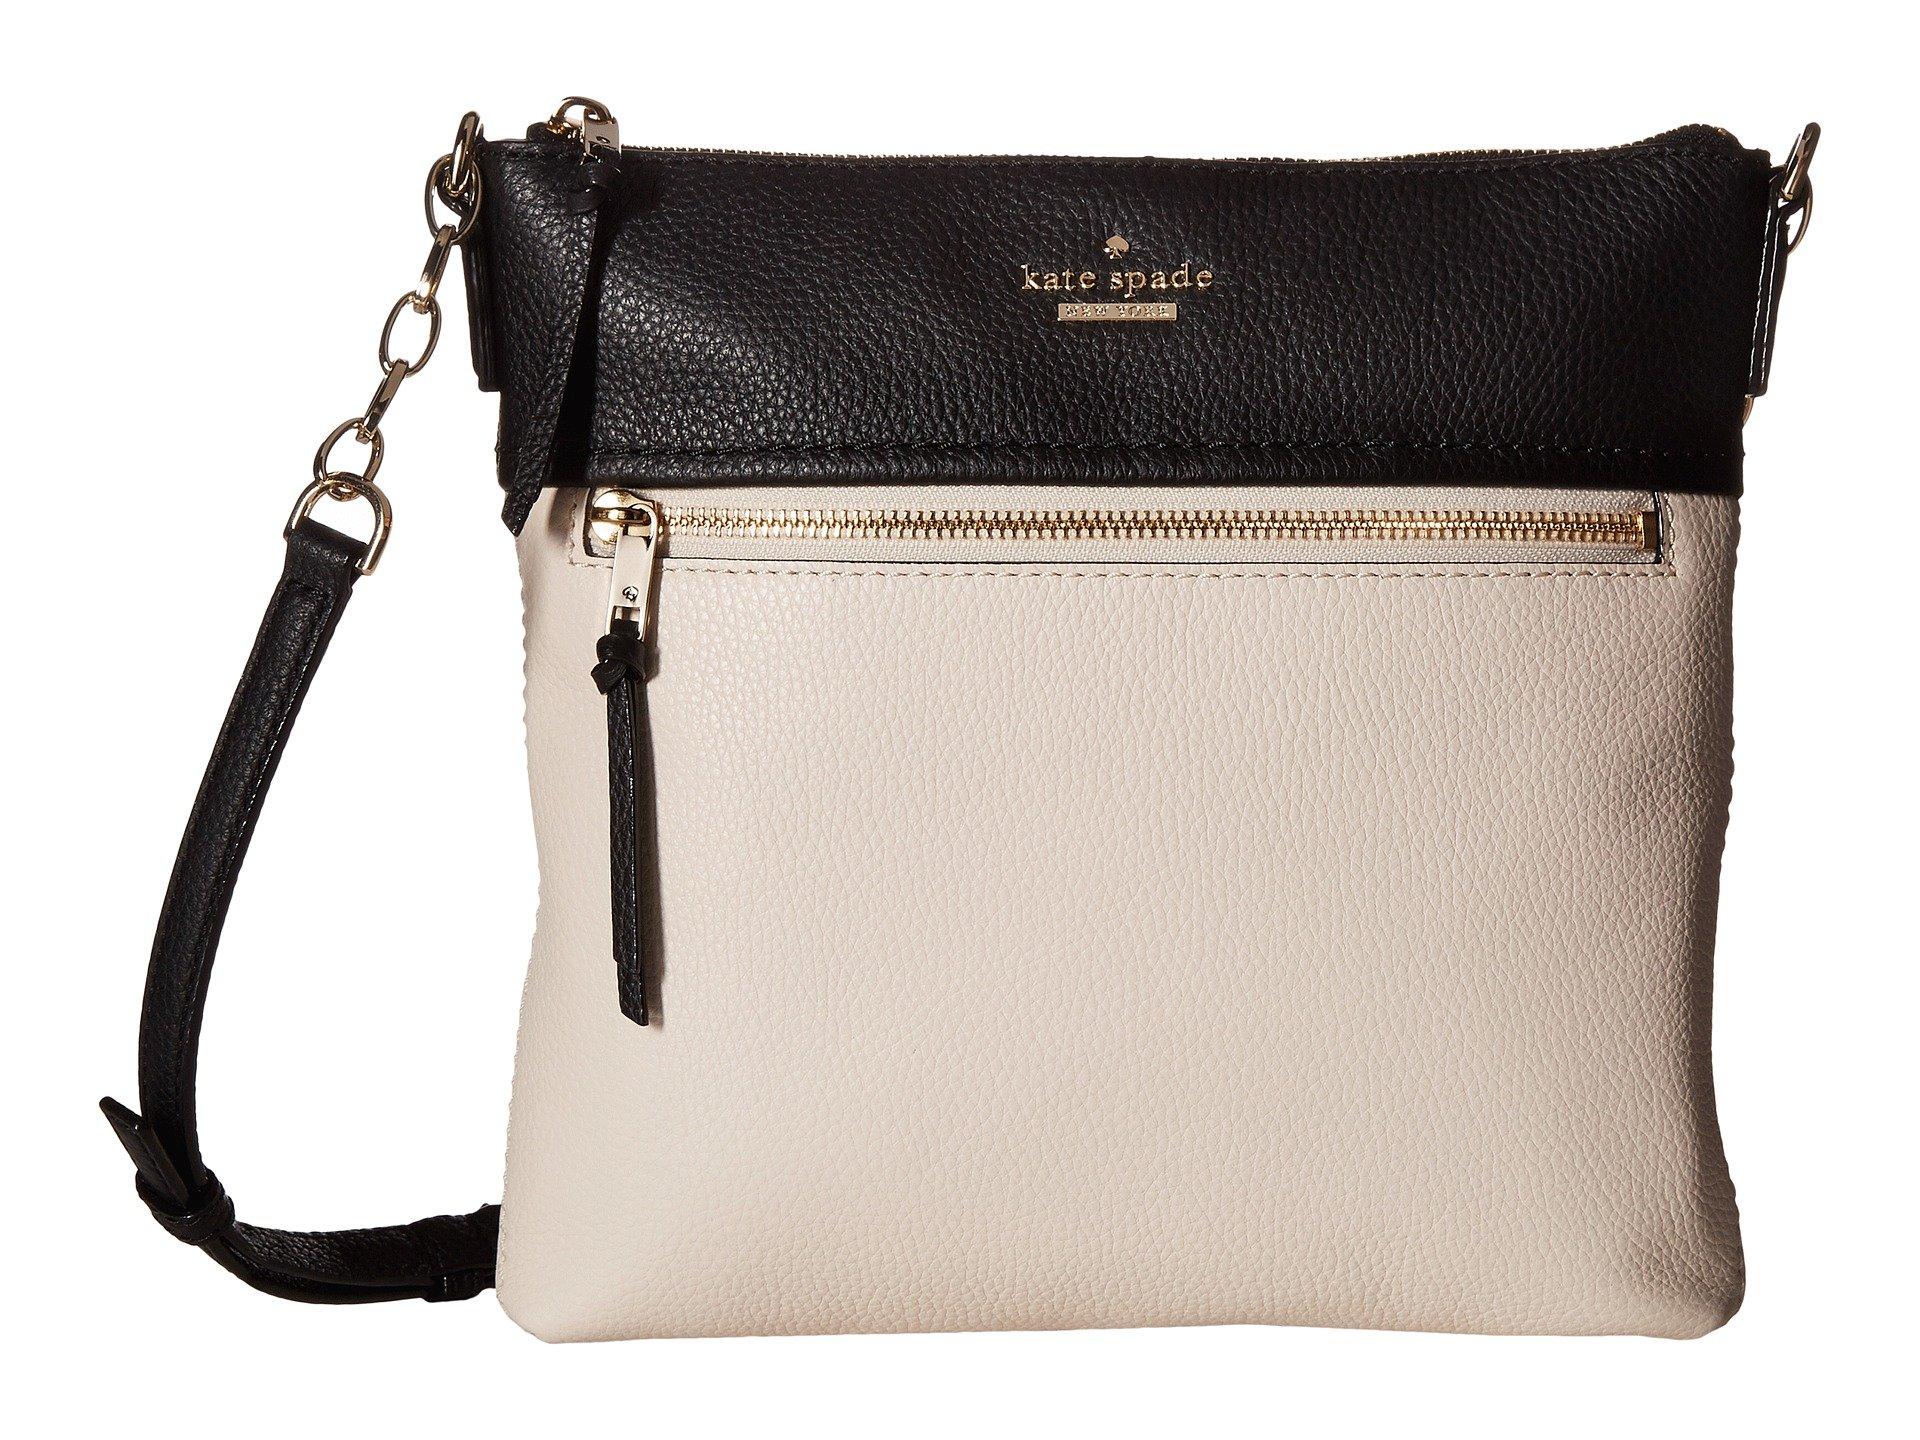 New Kate Spade New York Jackson Street Melisse Handbags, Black/Bone